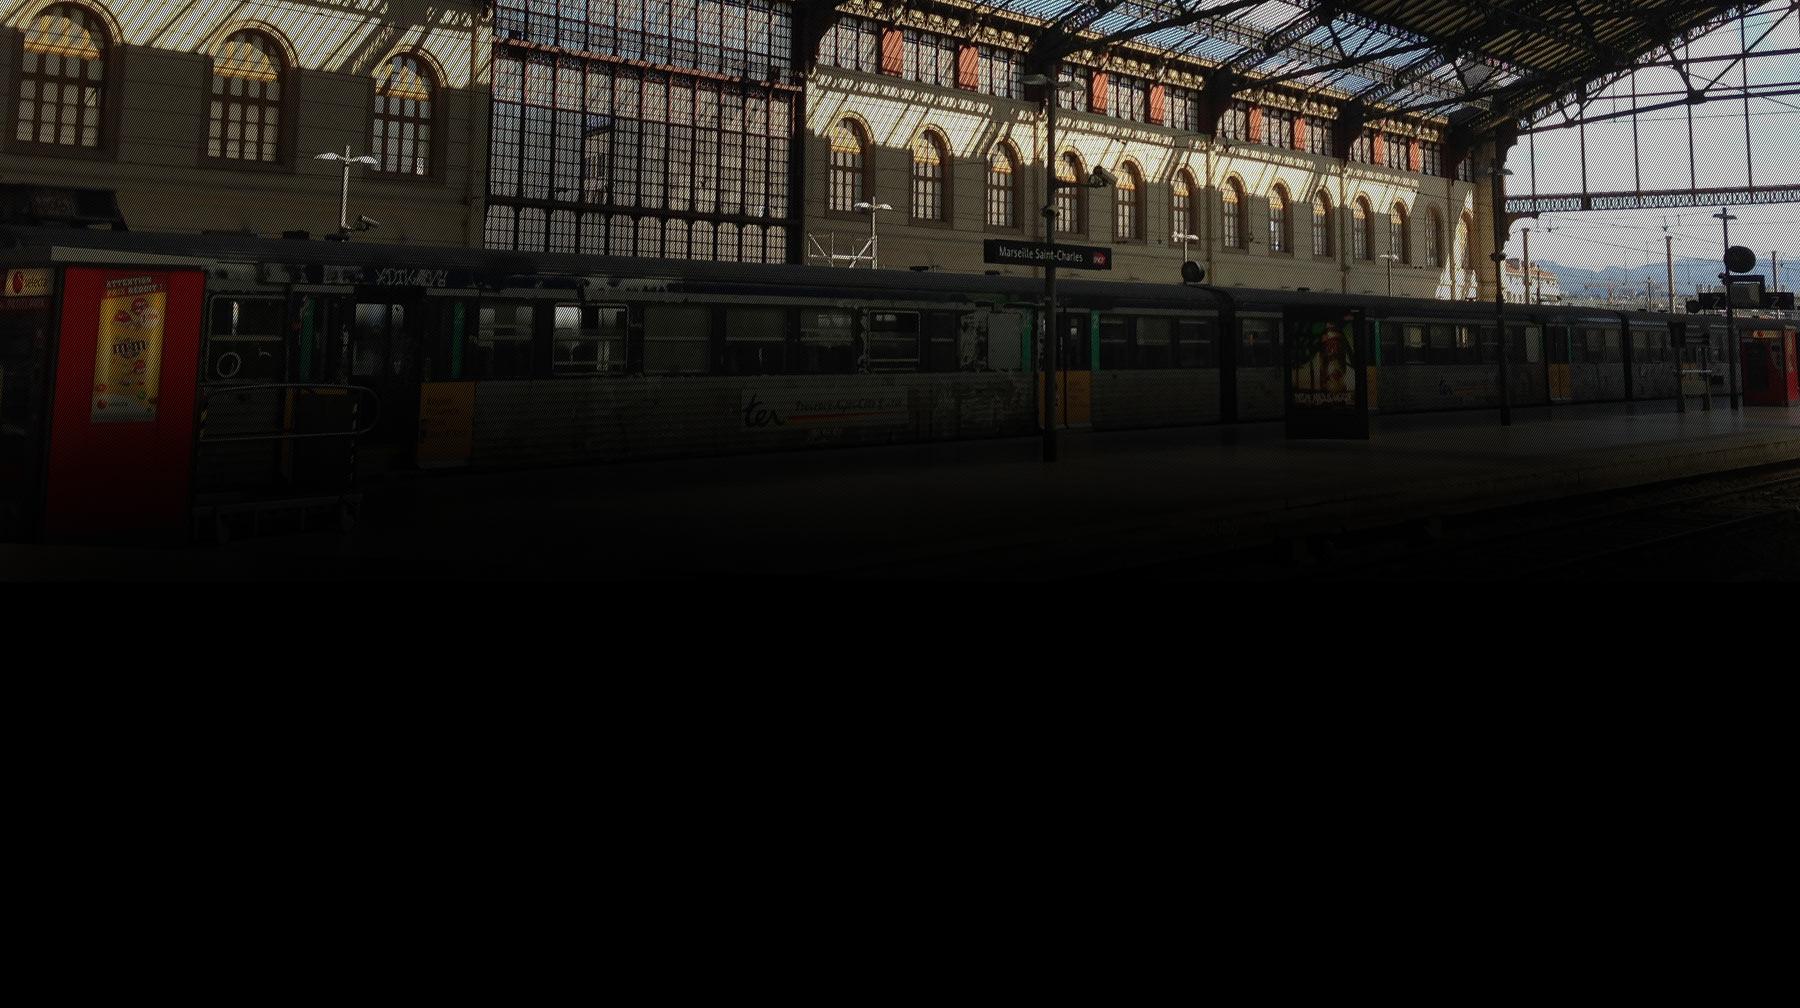 Marseille Gare Saint-Charles